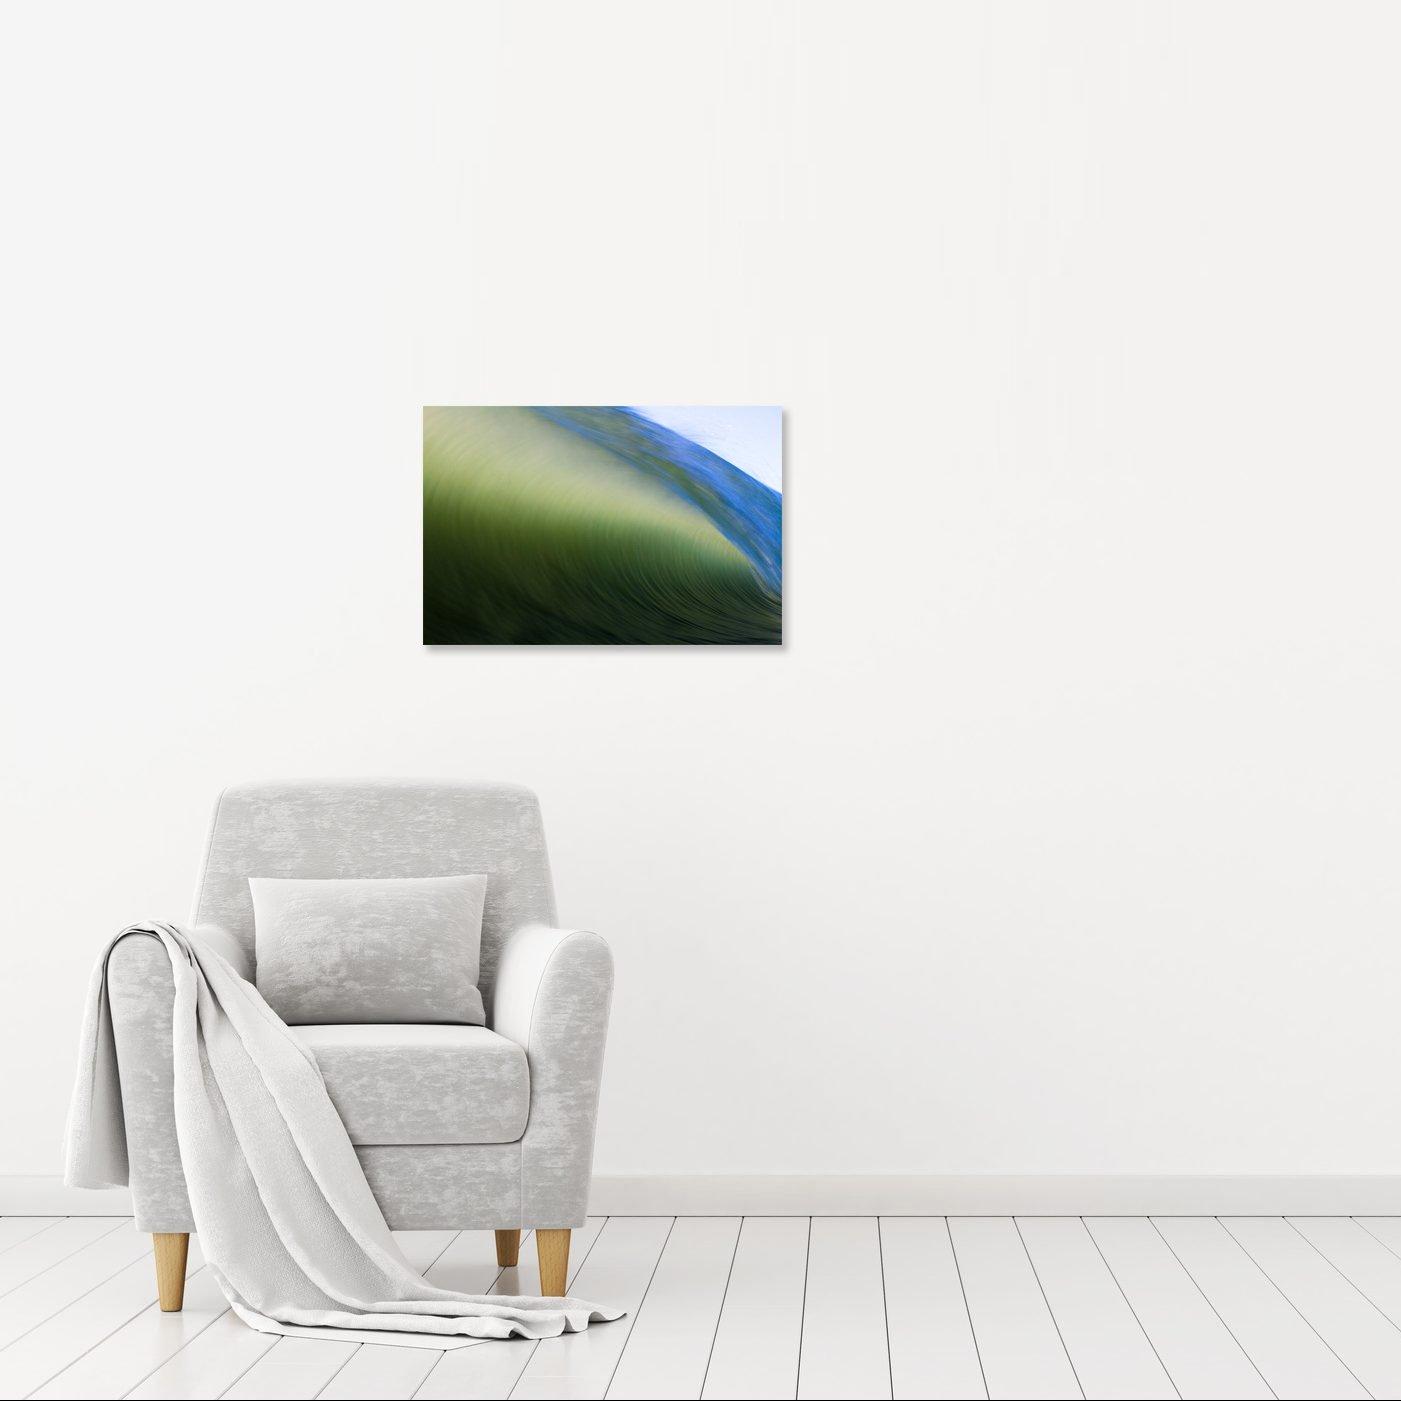 Buy Cornish Art Flow Motion Green Mr B In Situ